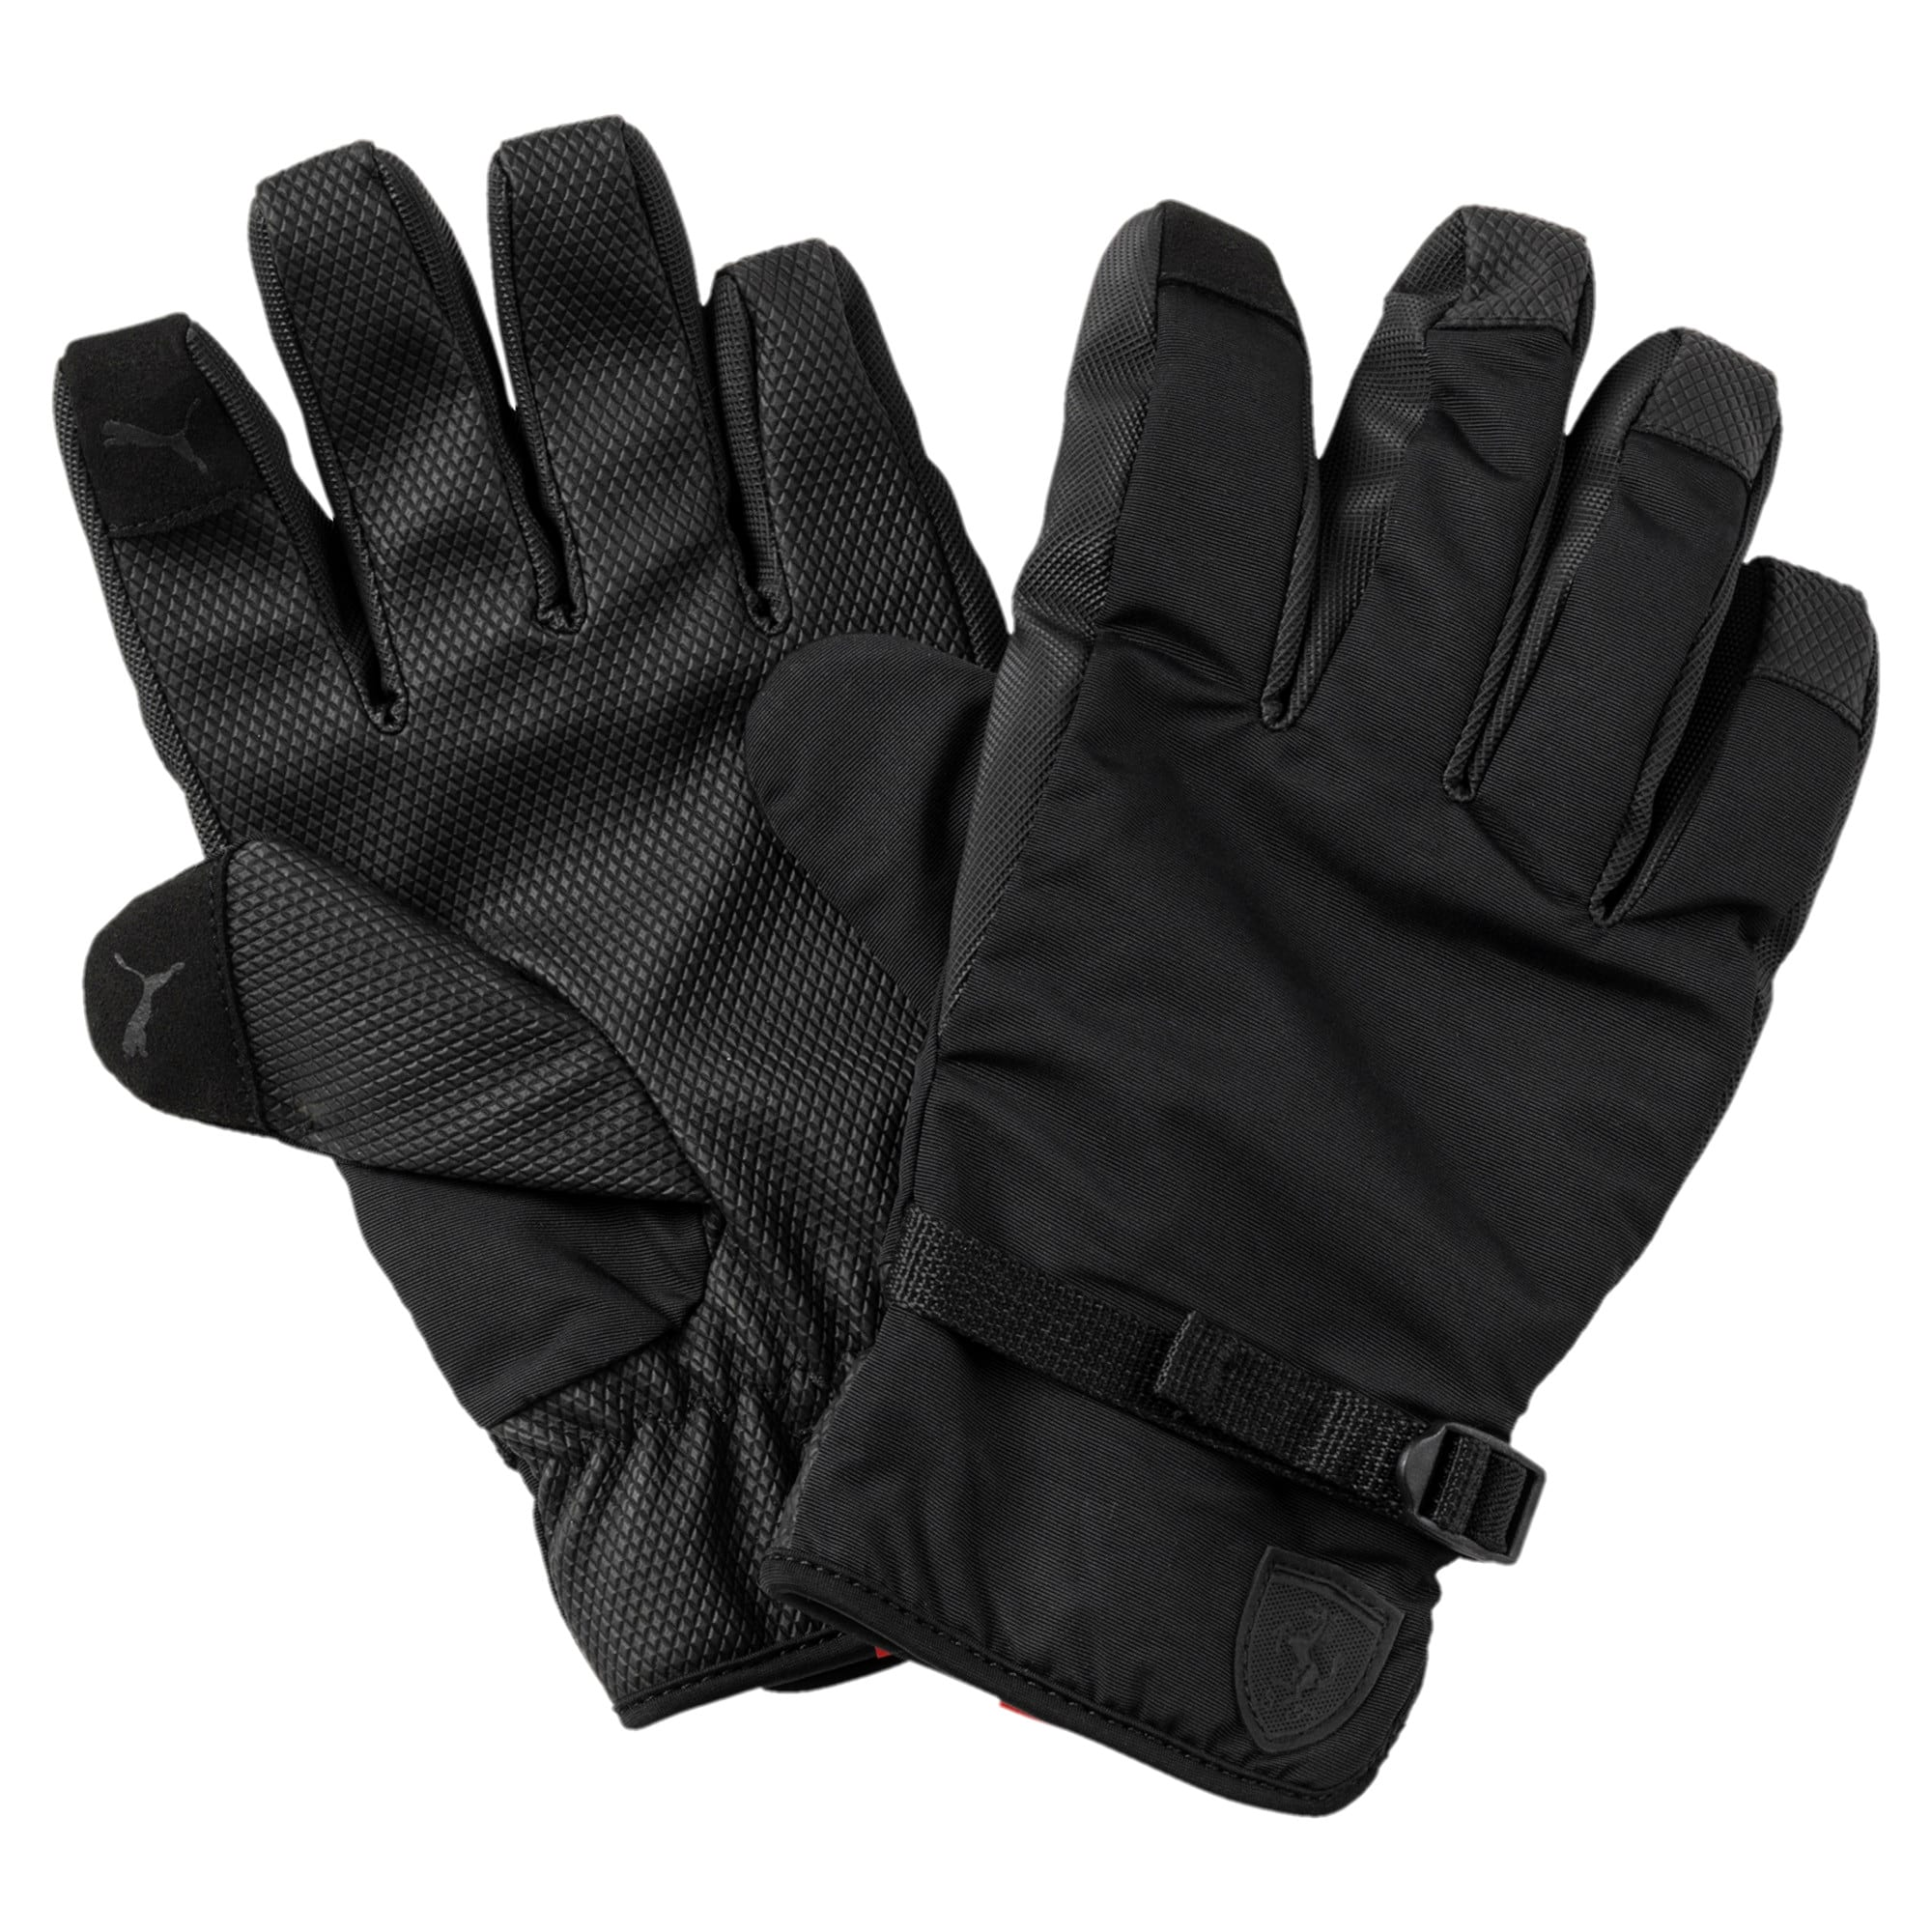 Thumbnail 1 of SF LS Gloves, Puma Black, medium-IND